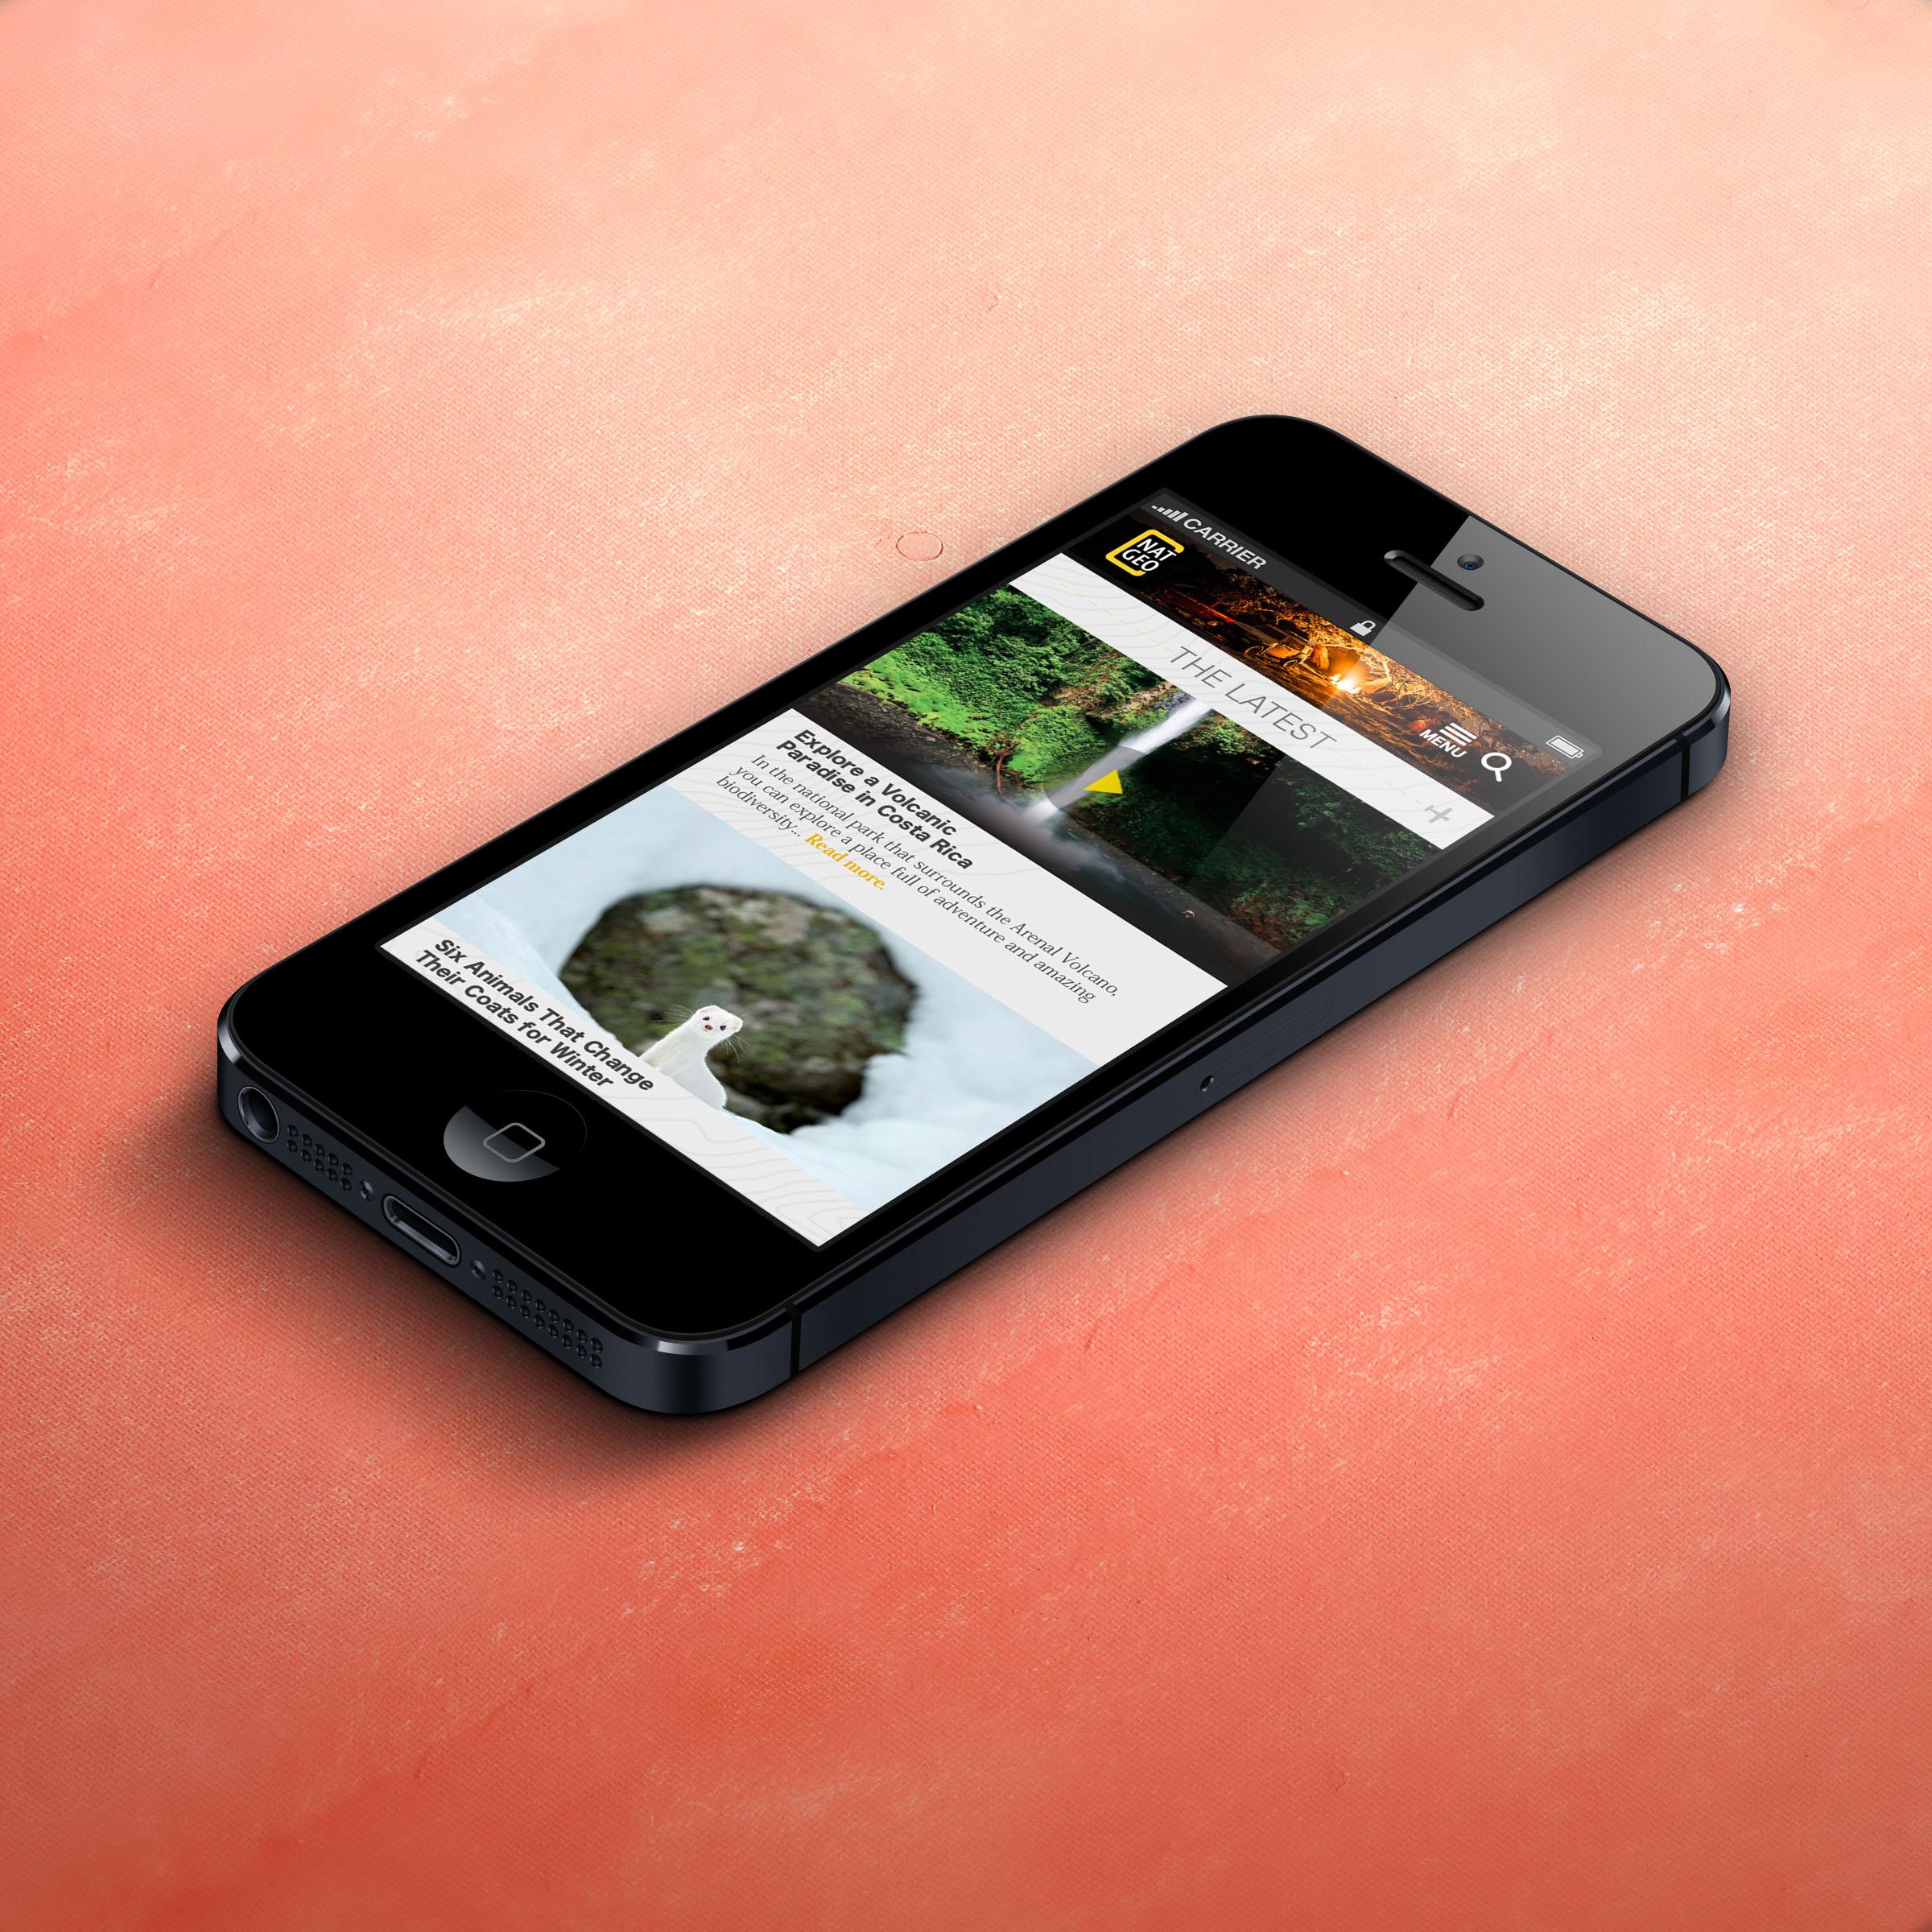 NatGeo Responsive iPhone.jpg